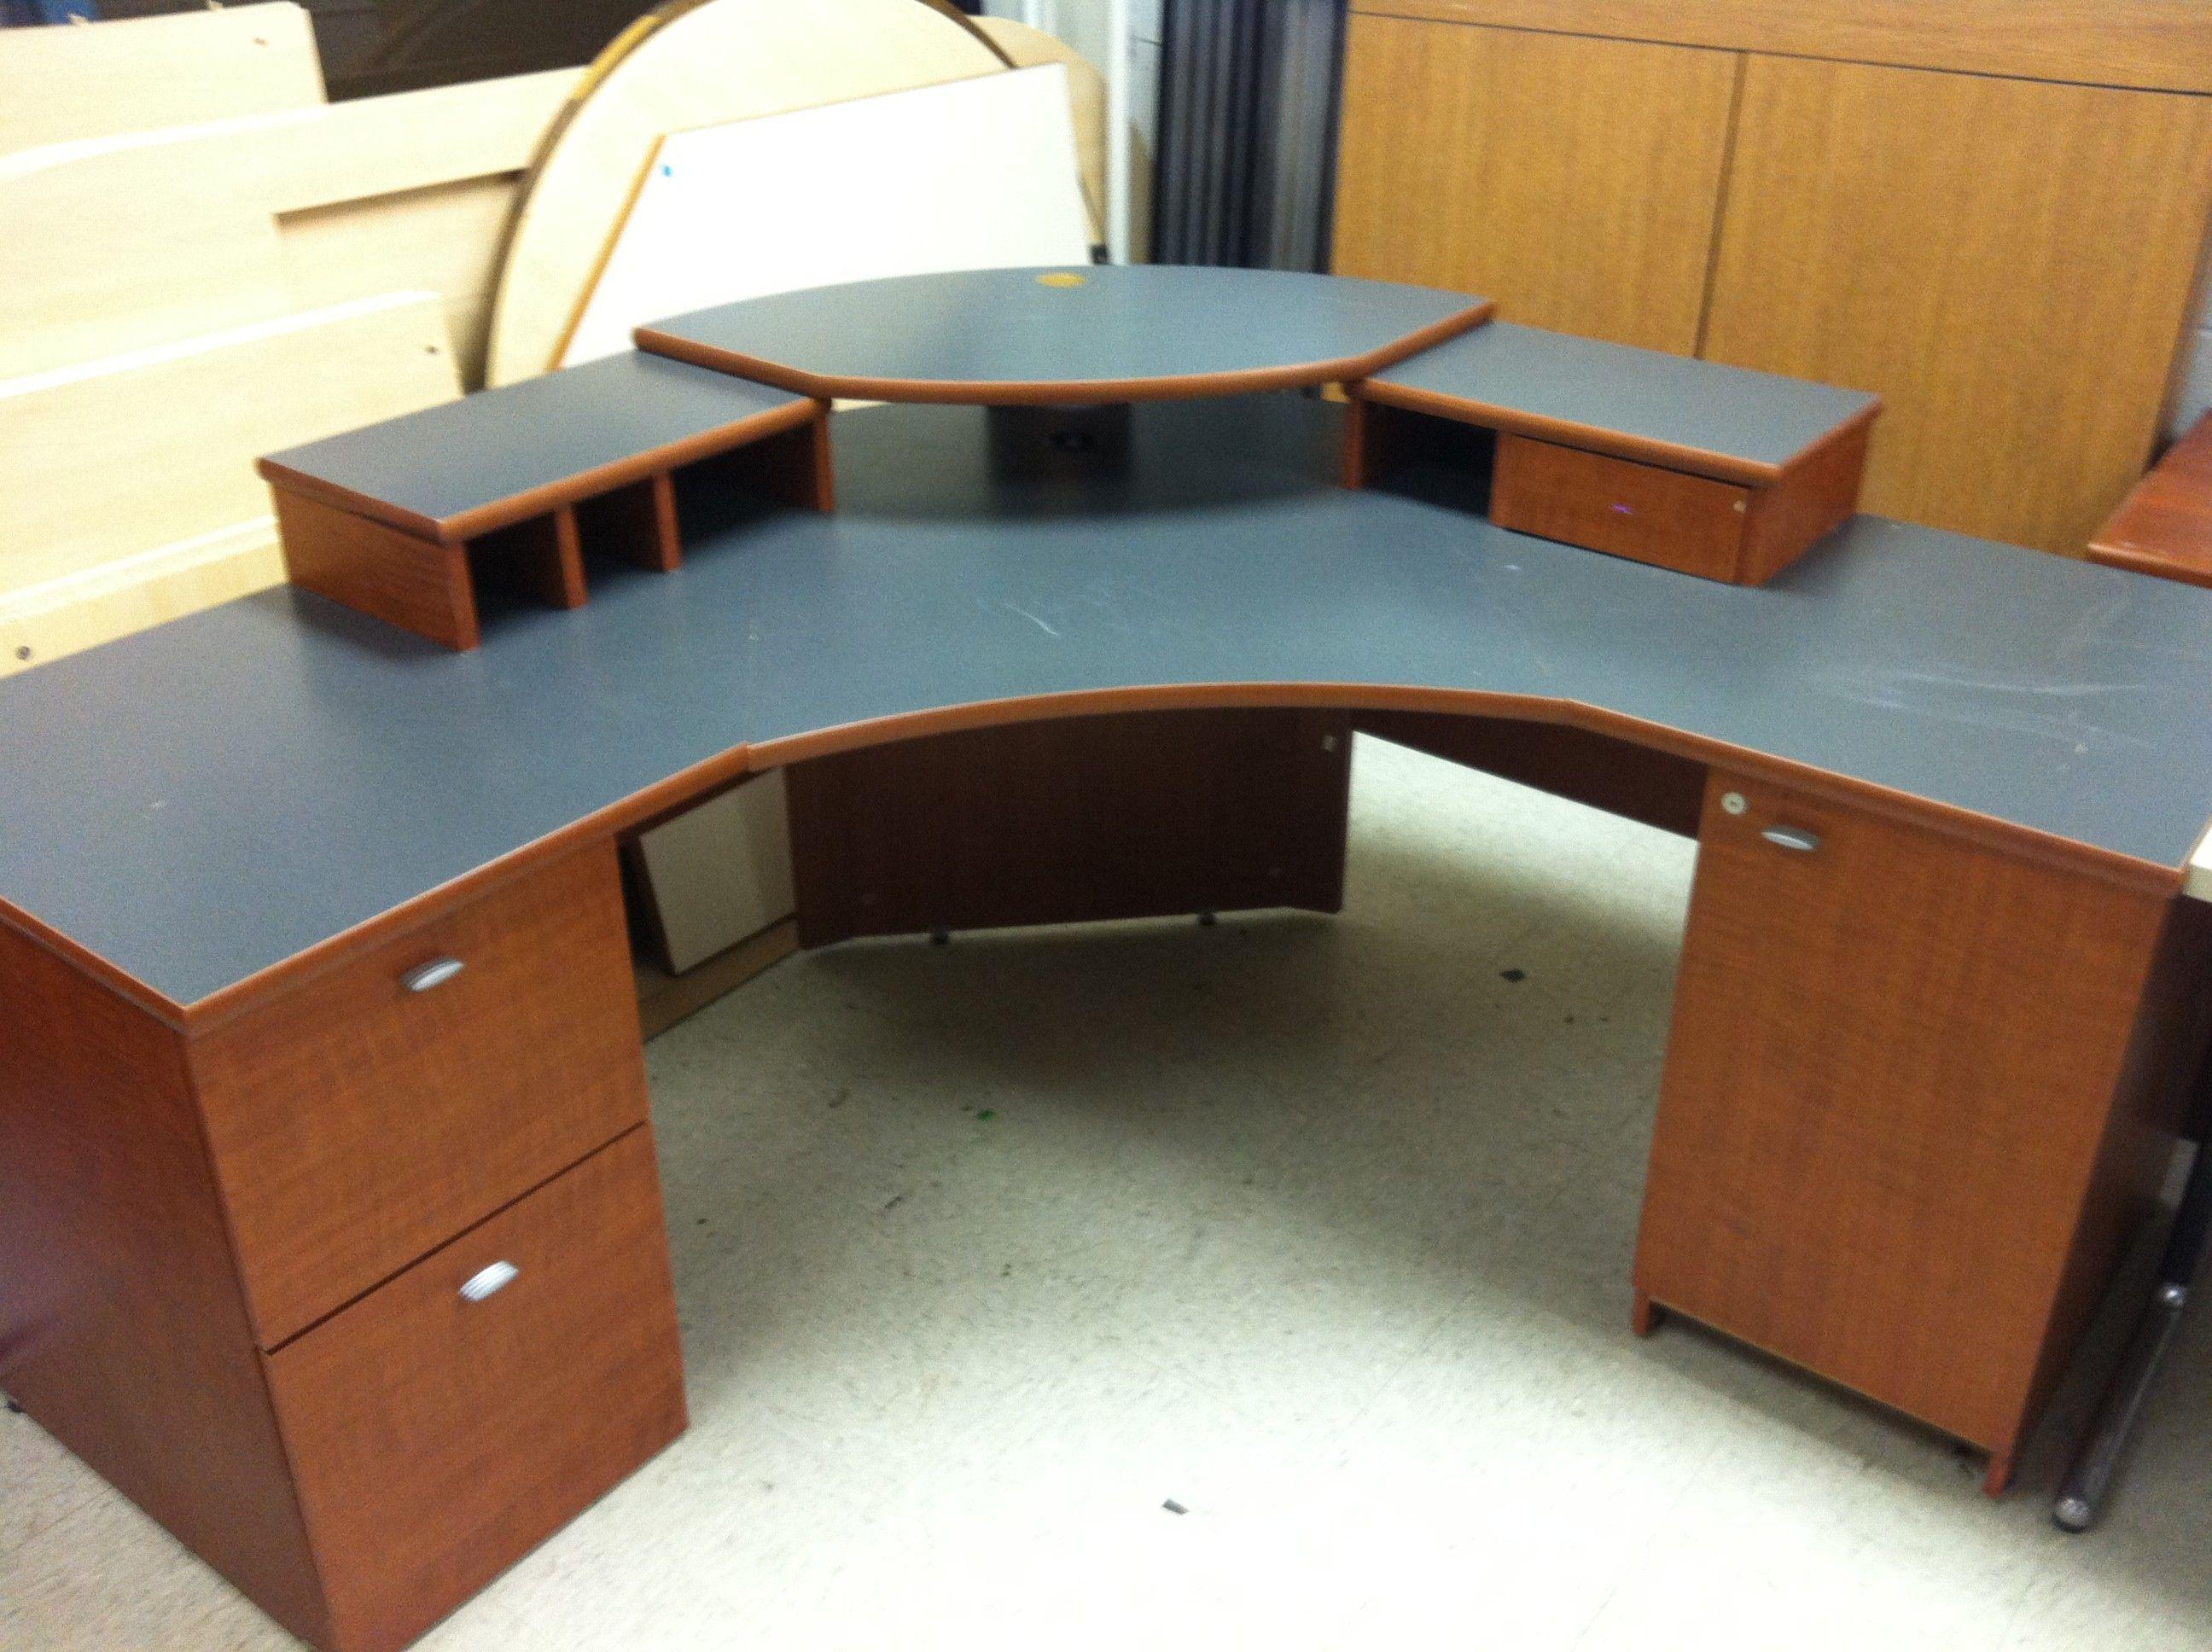 99 Cool Corner Desk Home Office Furniture Set Check More At Http Www Sewcraftyjenn Com Cool Corner Corner Computer Desk Office Desk Designs Computer Desk